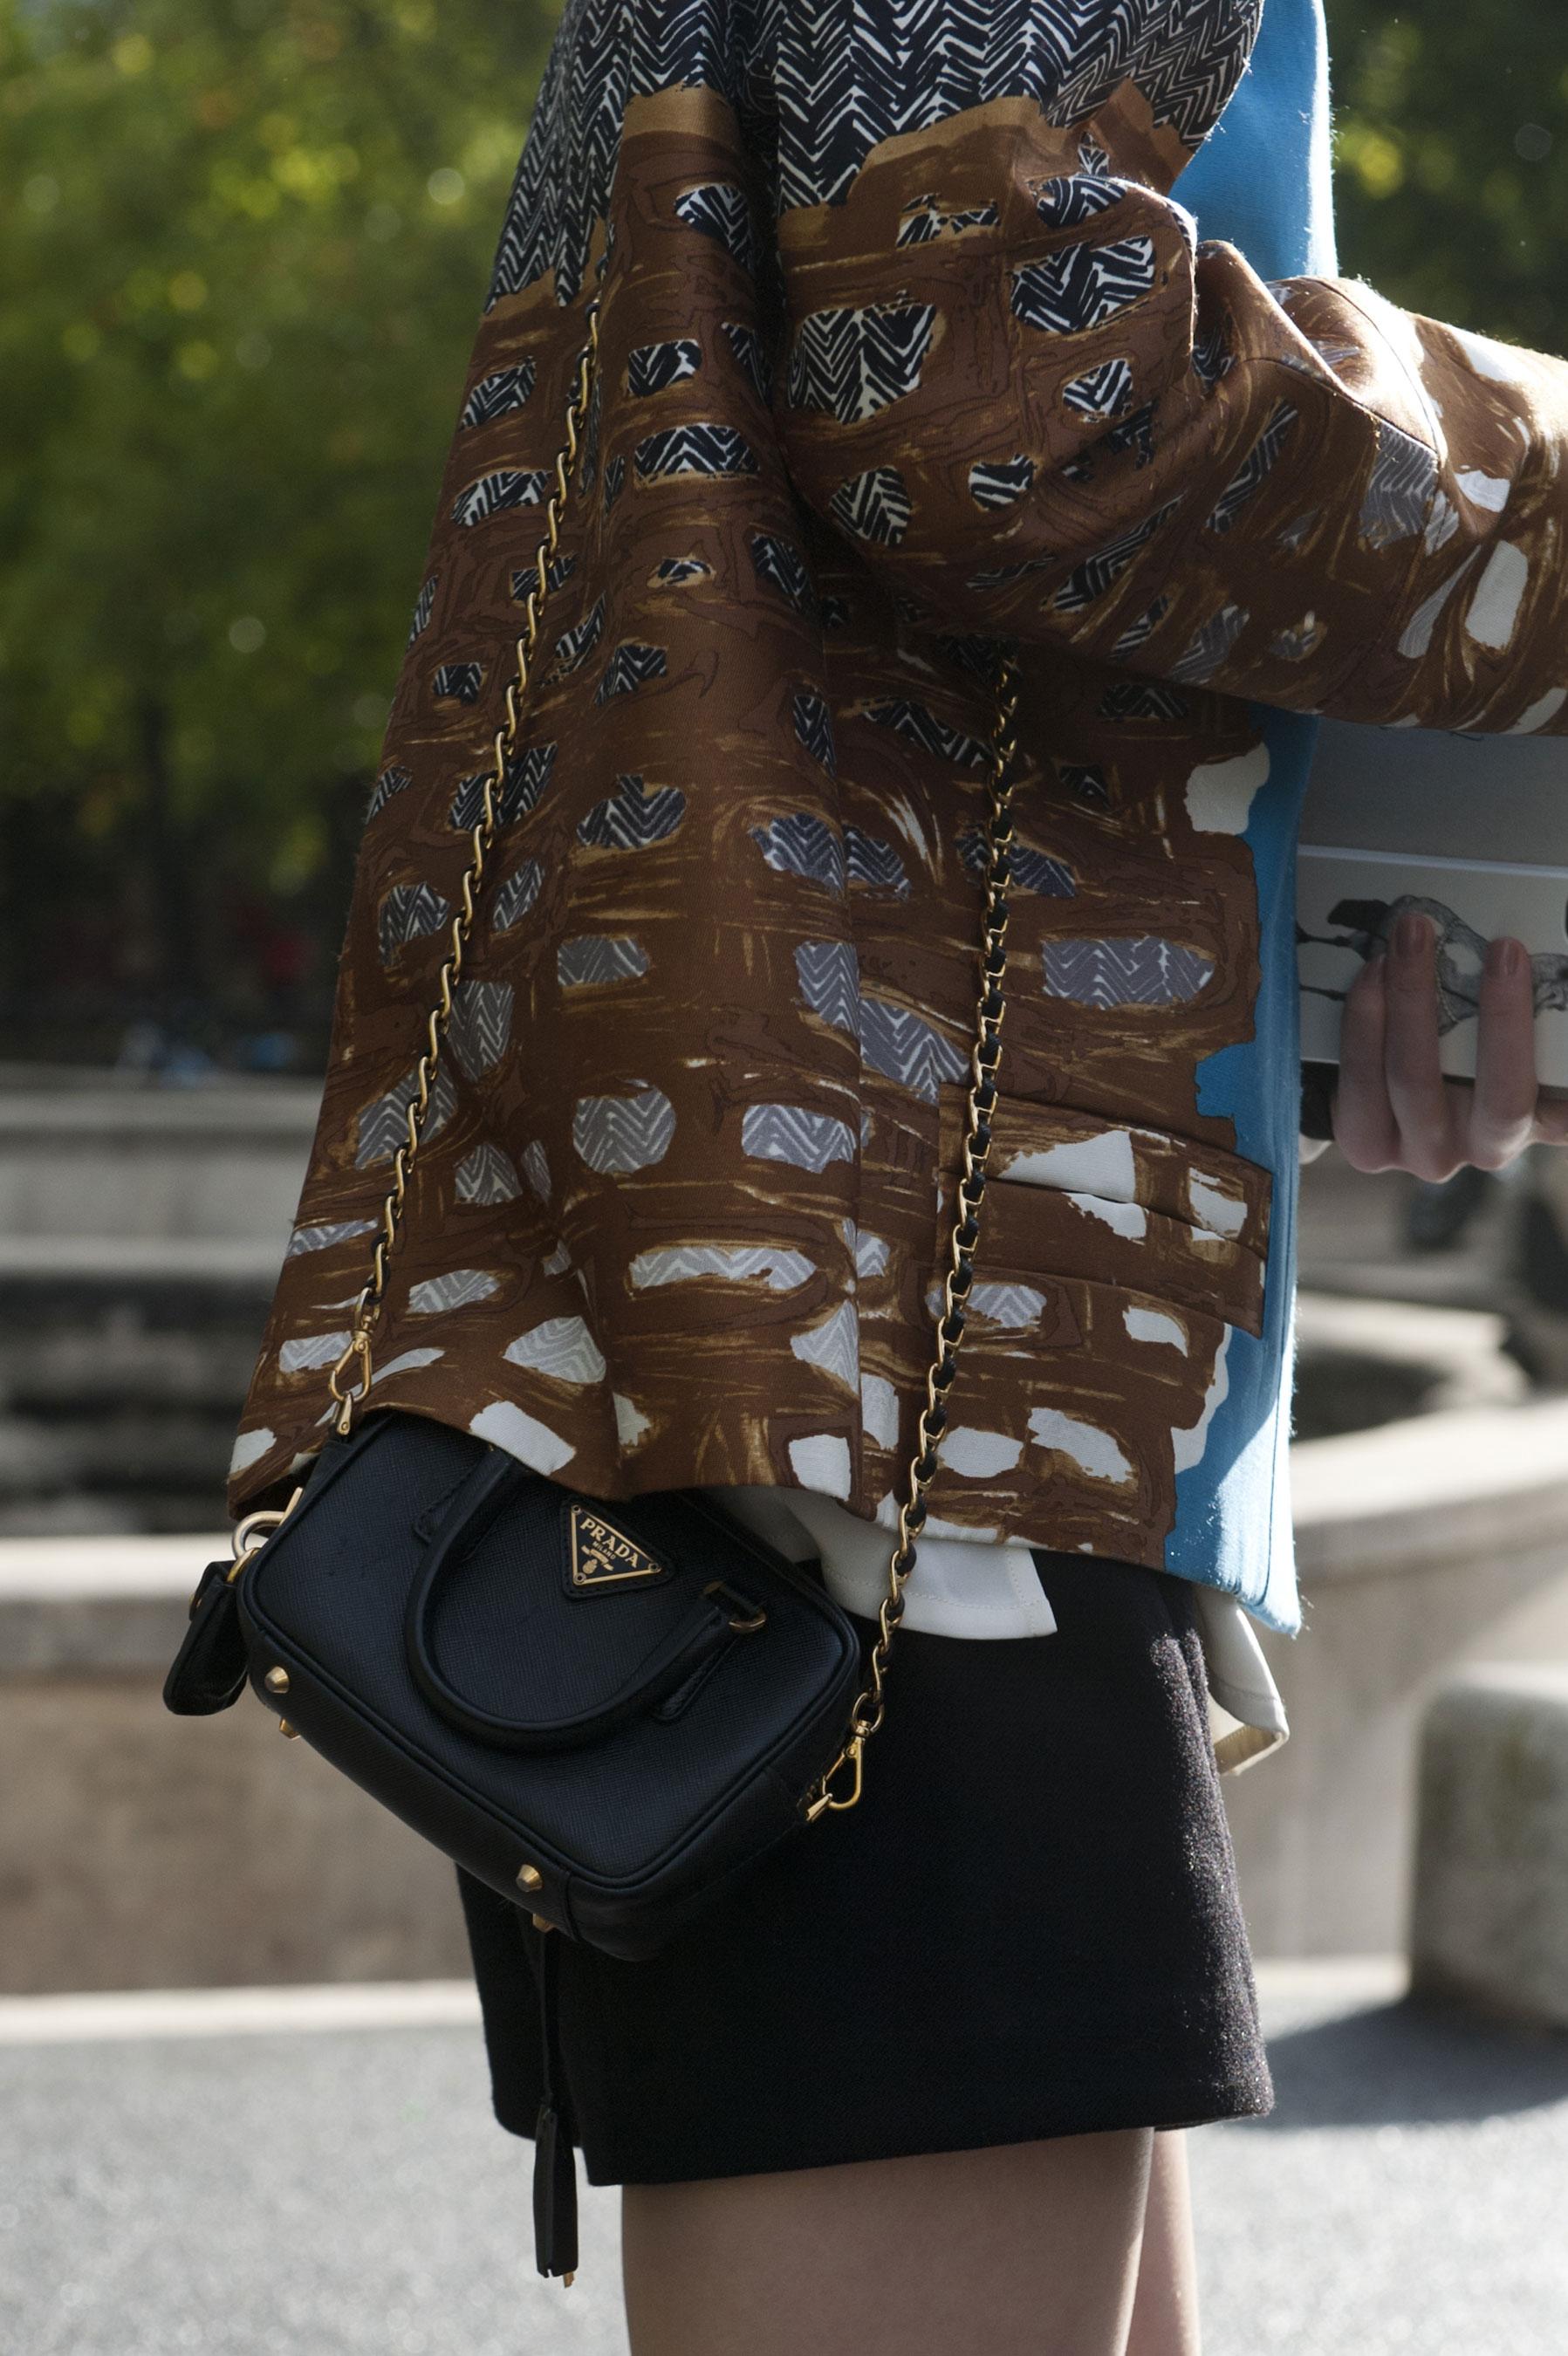 prada imitation purses - Prada-chain-clutch-luxe-understated-option.jpg